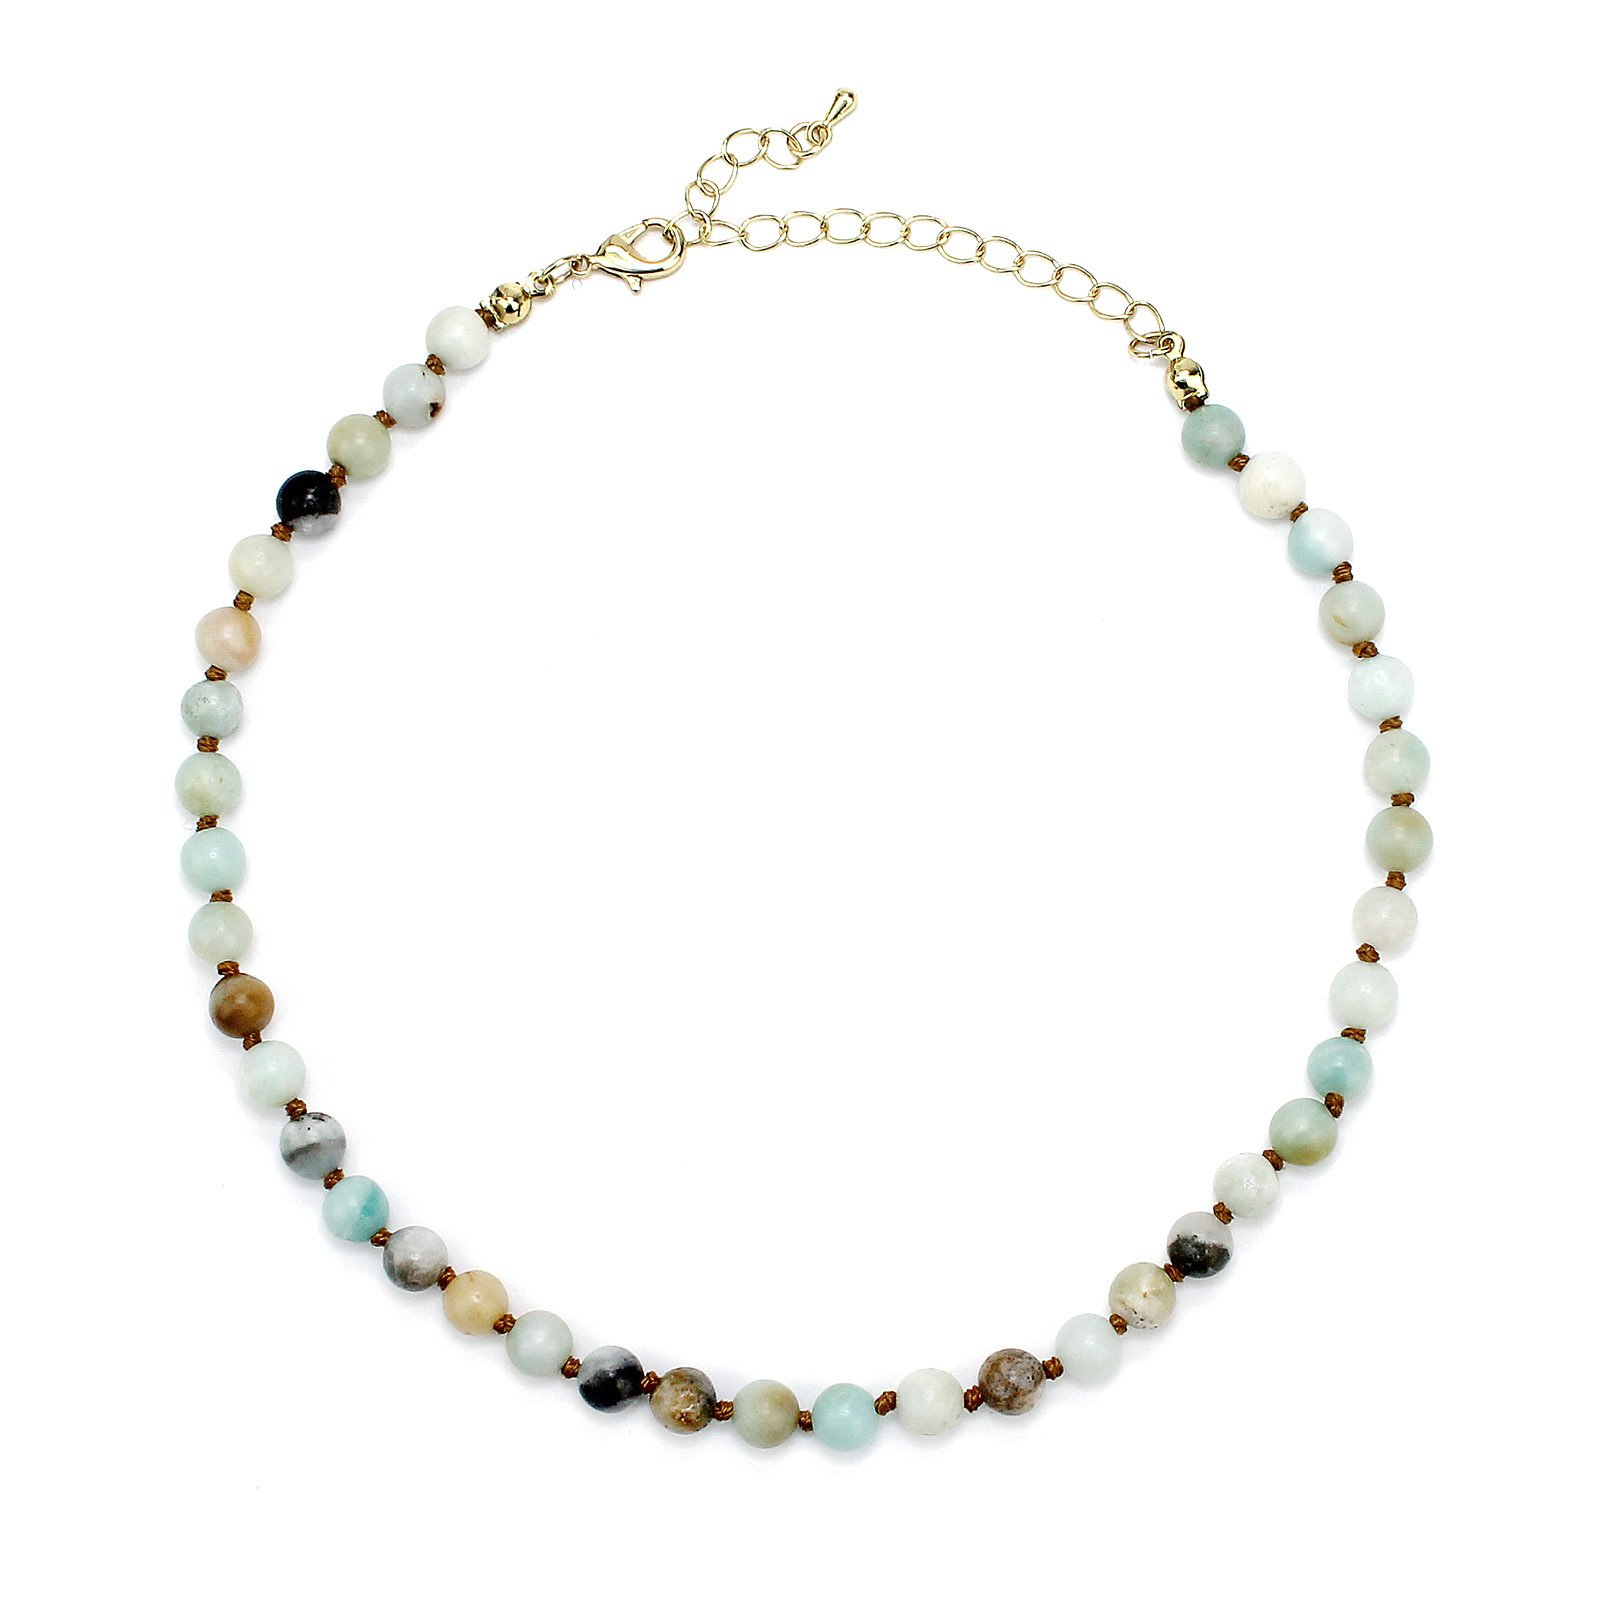 POMINA 6mm Amazonite Semi Precious Stone Beaded Short Necklaces, 16 inches (Amazonite)